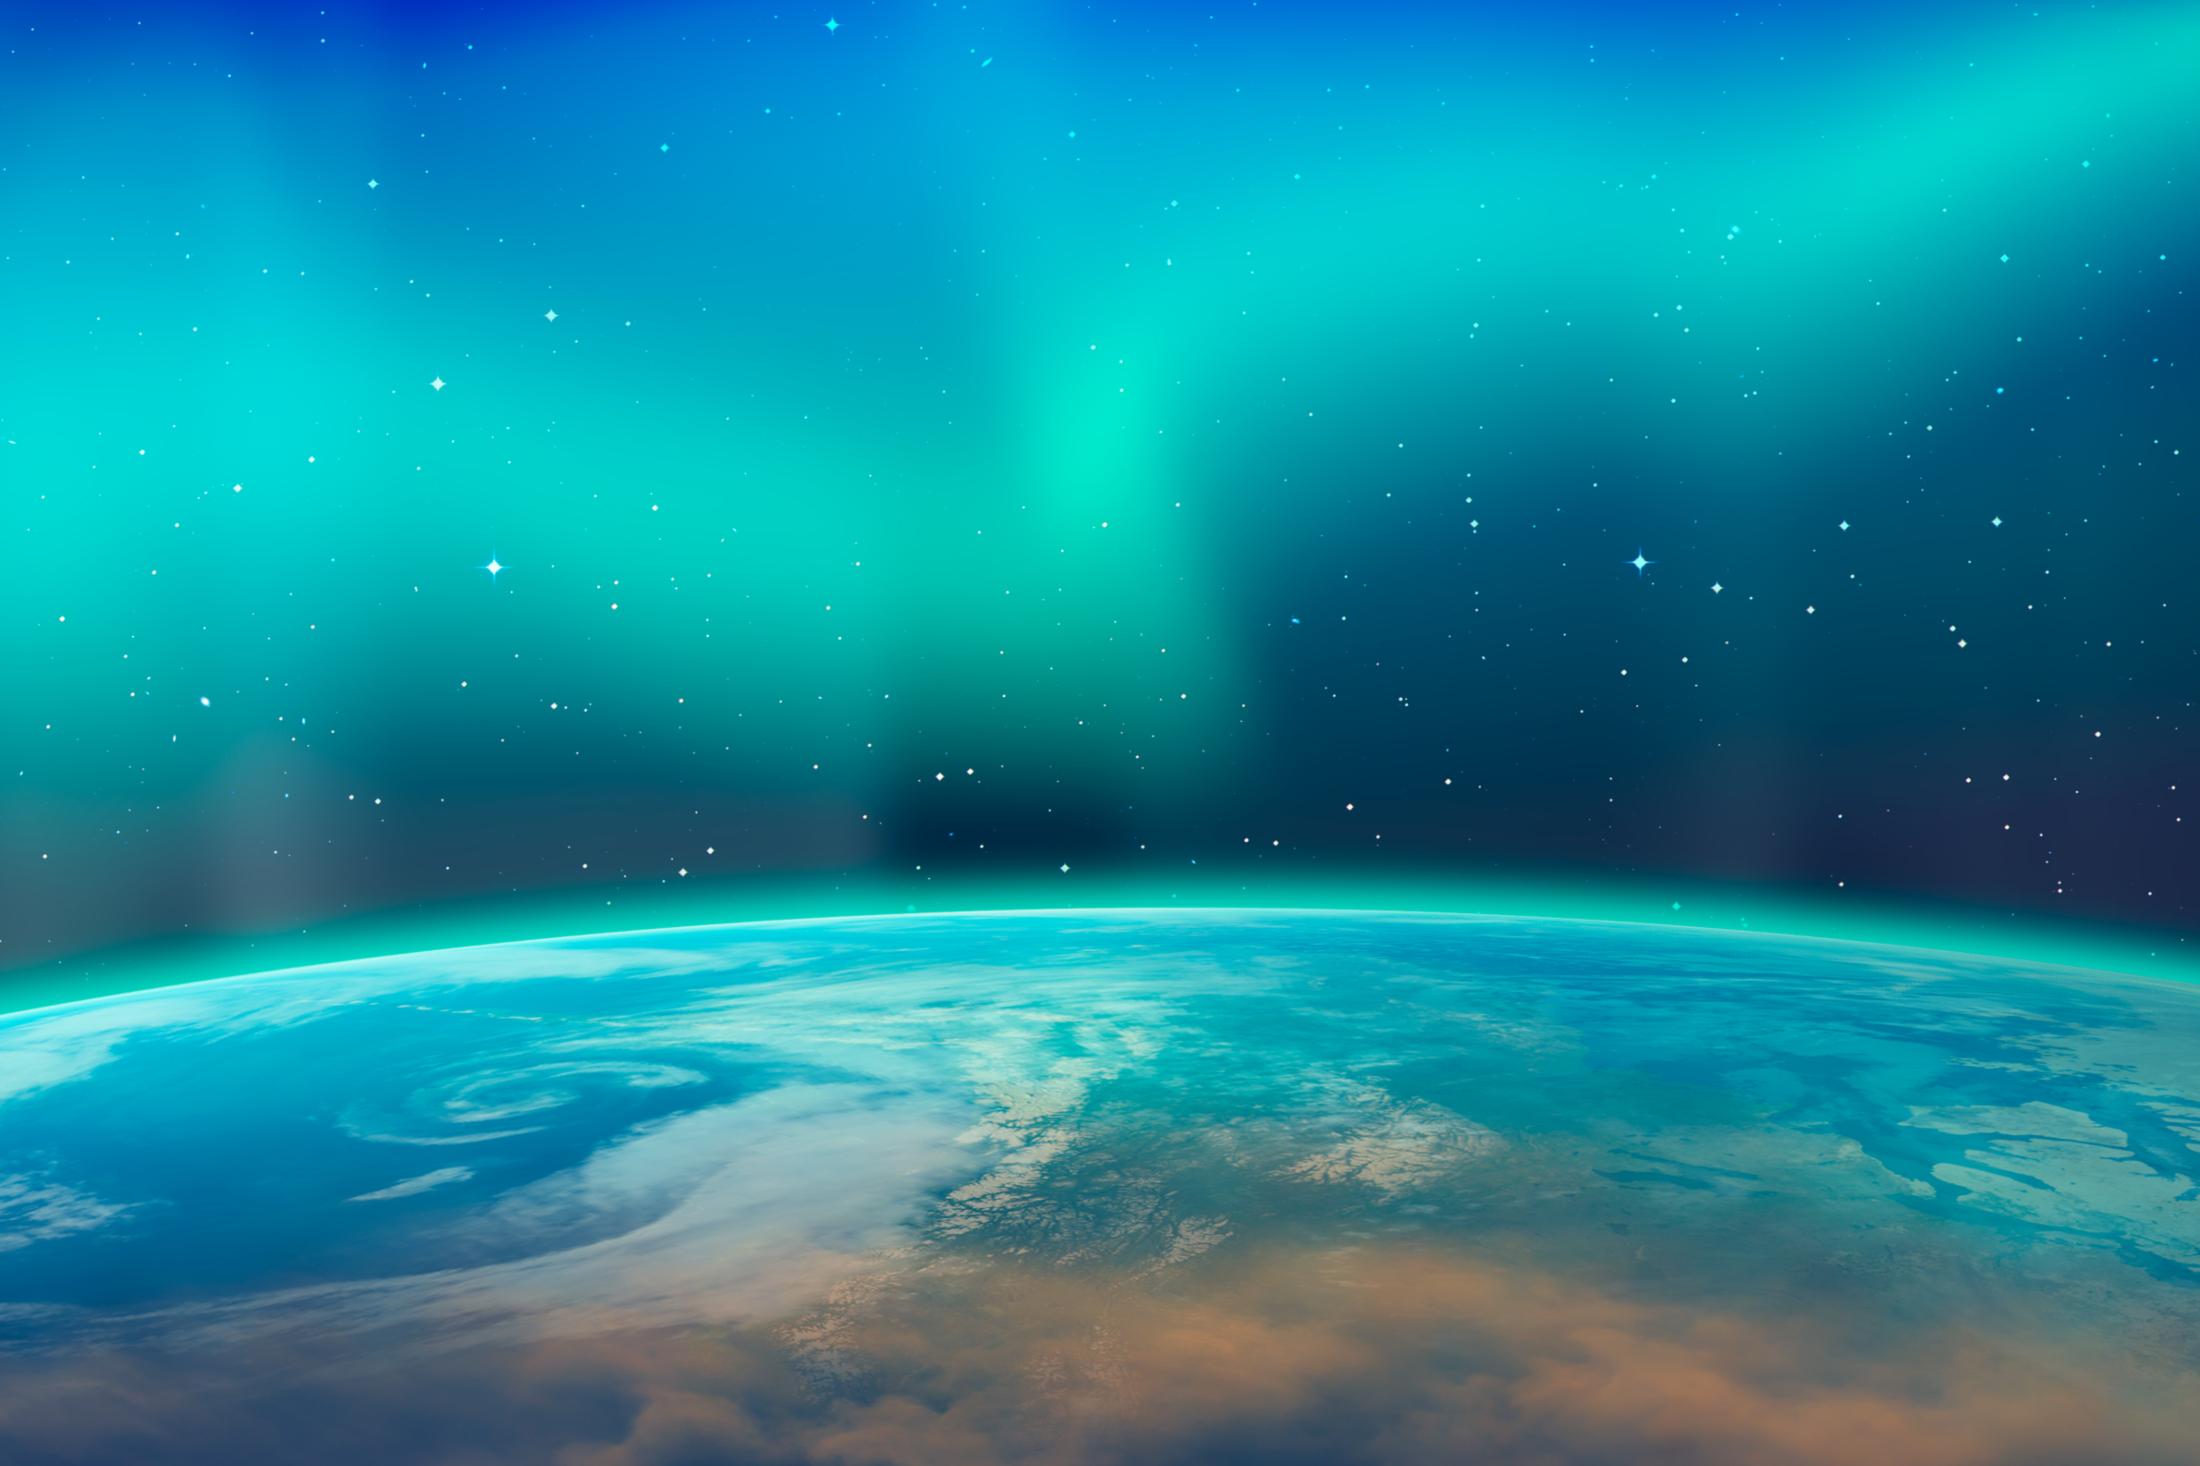 Aurora borealis aka northern lights. Elements of image furnished by NASA. Image_ Mura T, Shutterstock